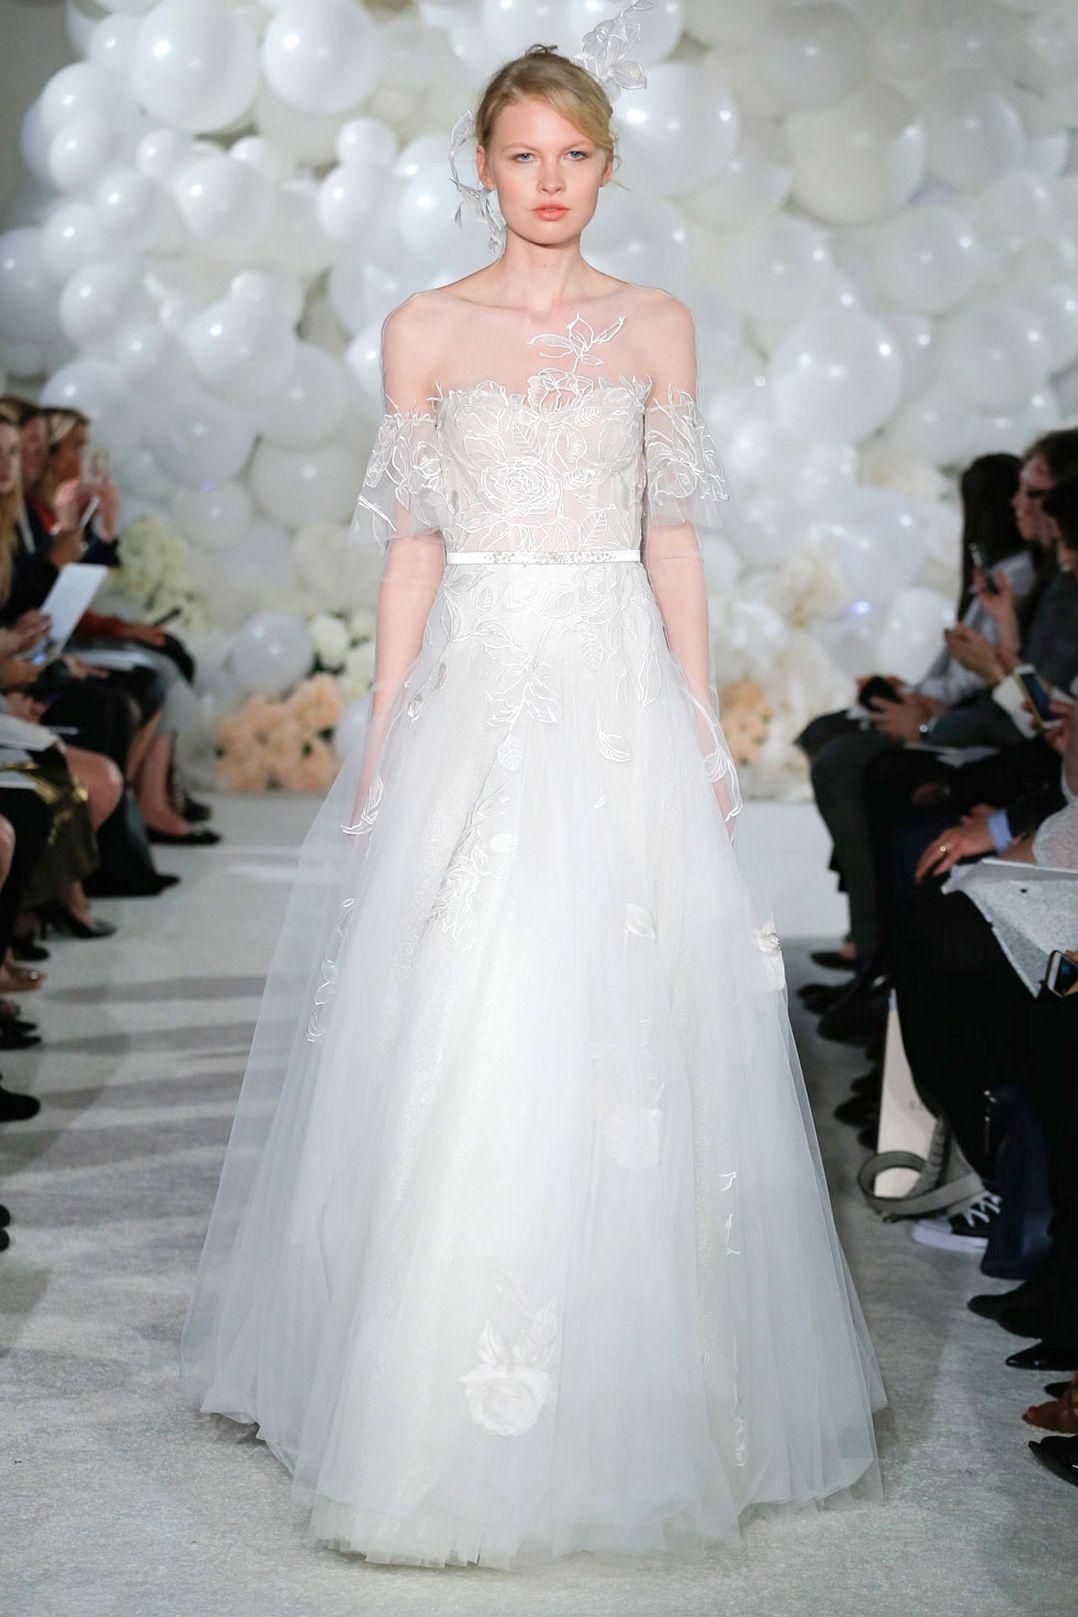 Wedding beach dress   Beautiful Beach Wedding Dresses to Inspire You  Beach weddings